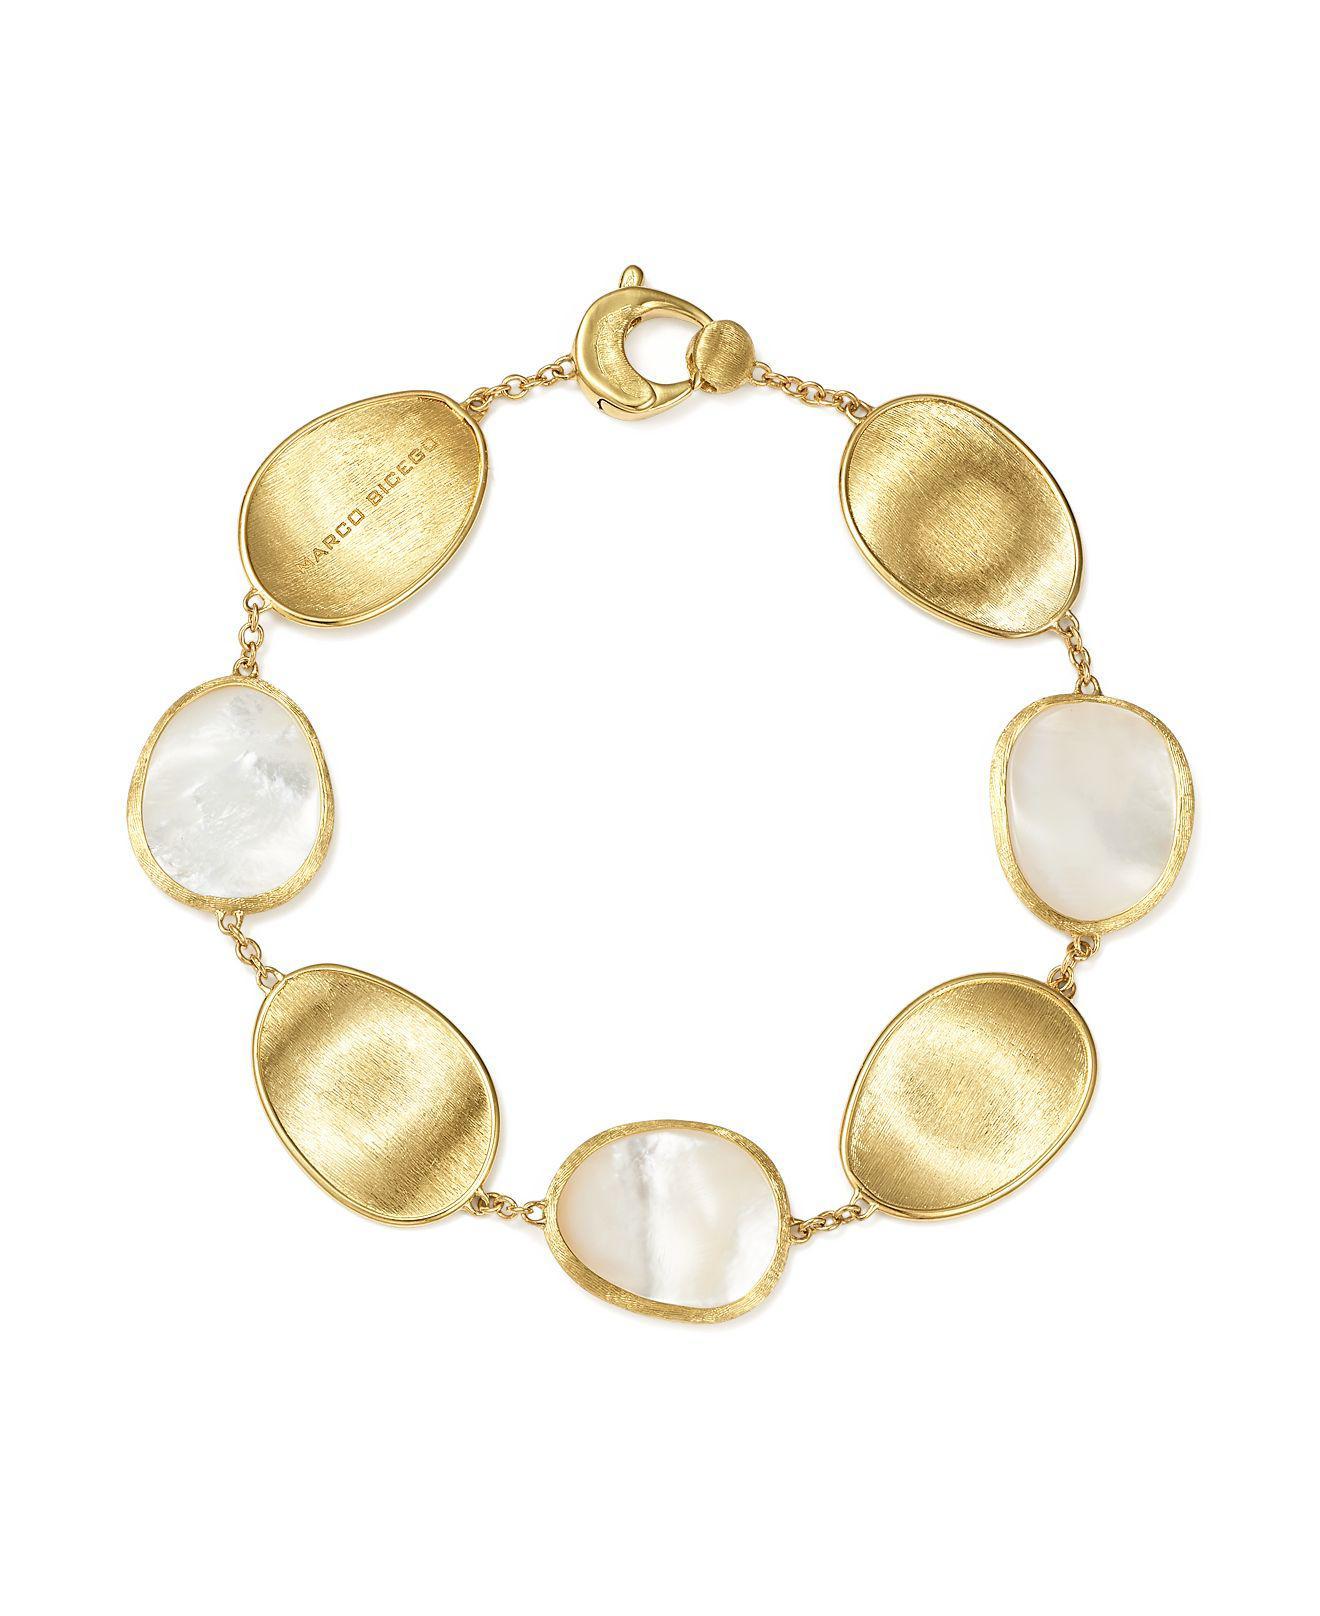 Marco Bicego Lunaria Three-Row Mother-of-Pearl Bracelet with Diamonds shwKJ